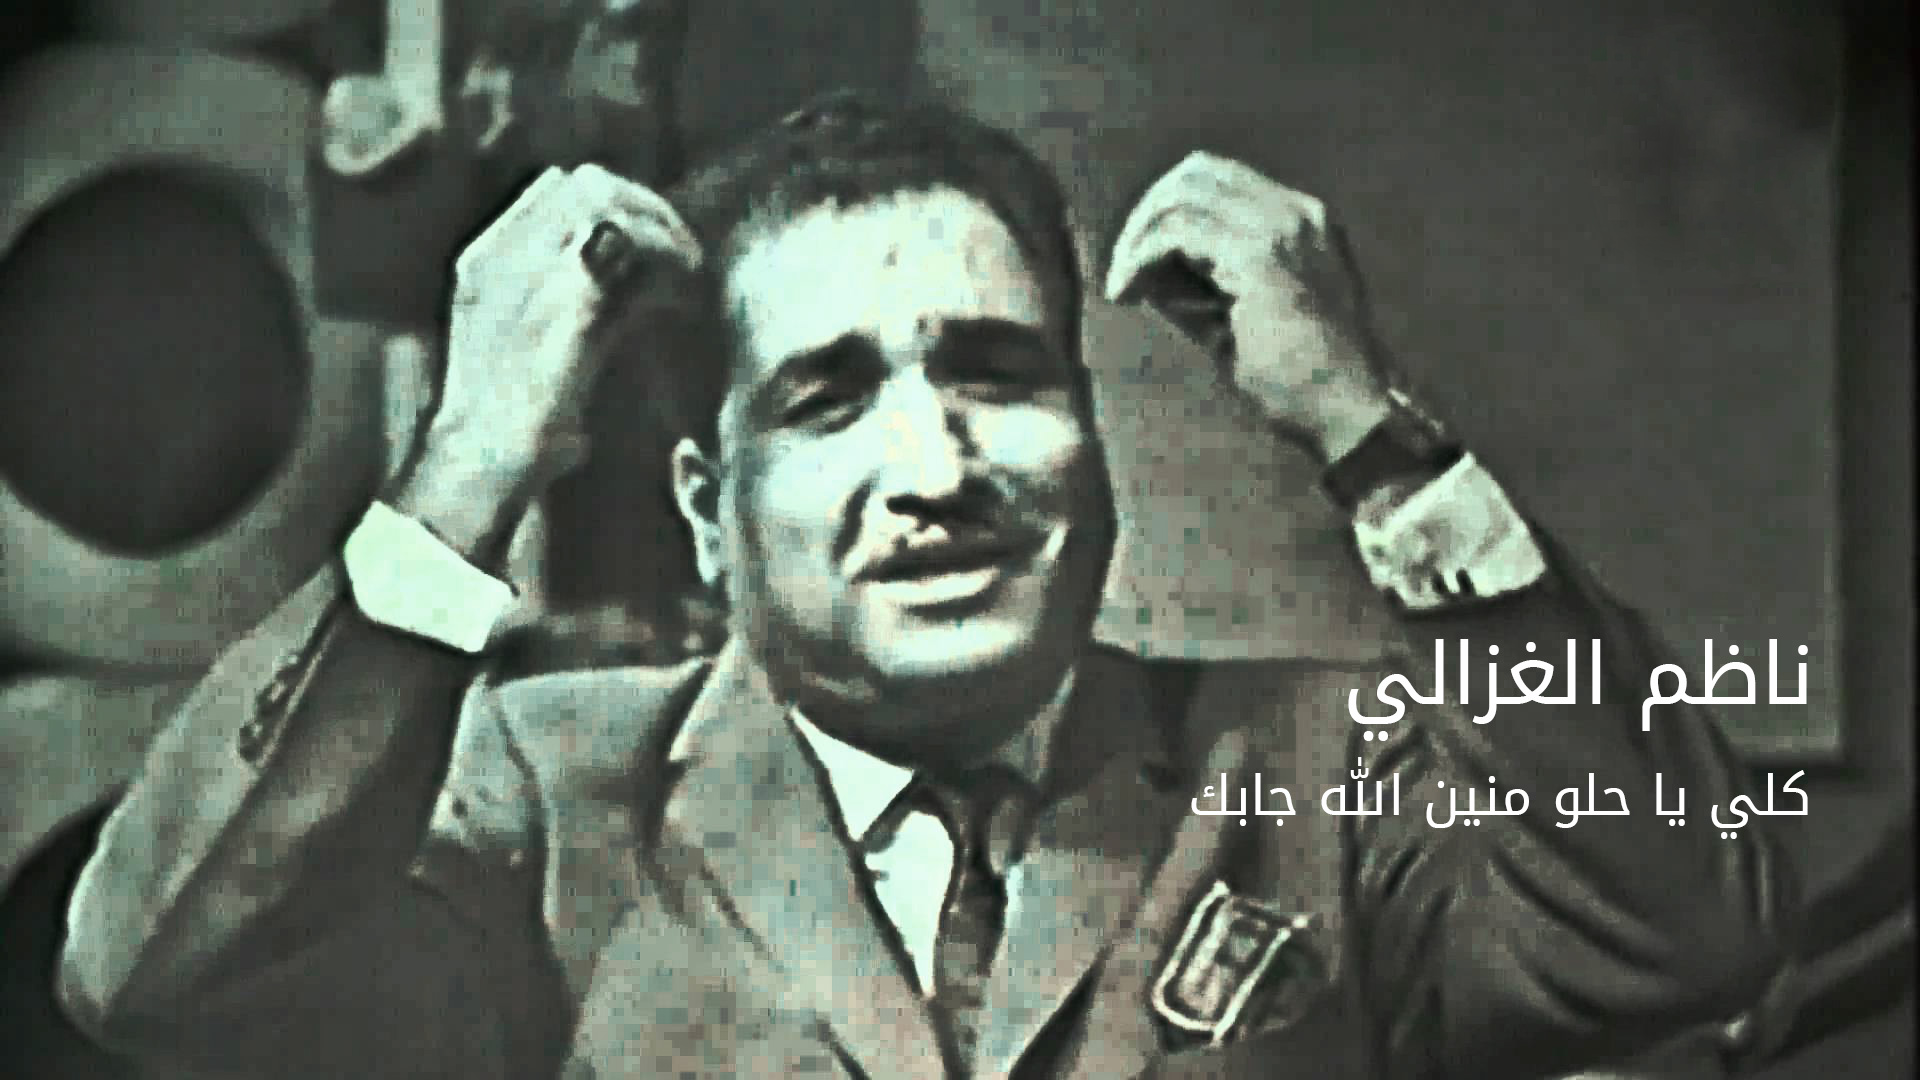 Nathem Al Ghazaly - Golly Ya Hiloo ناظم الغزالي - كلي يا حلو منين الله جابك